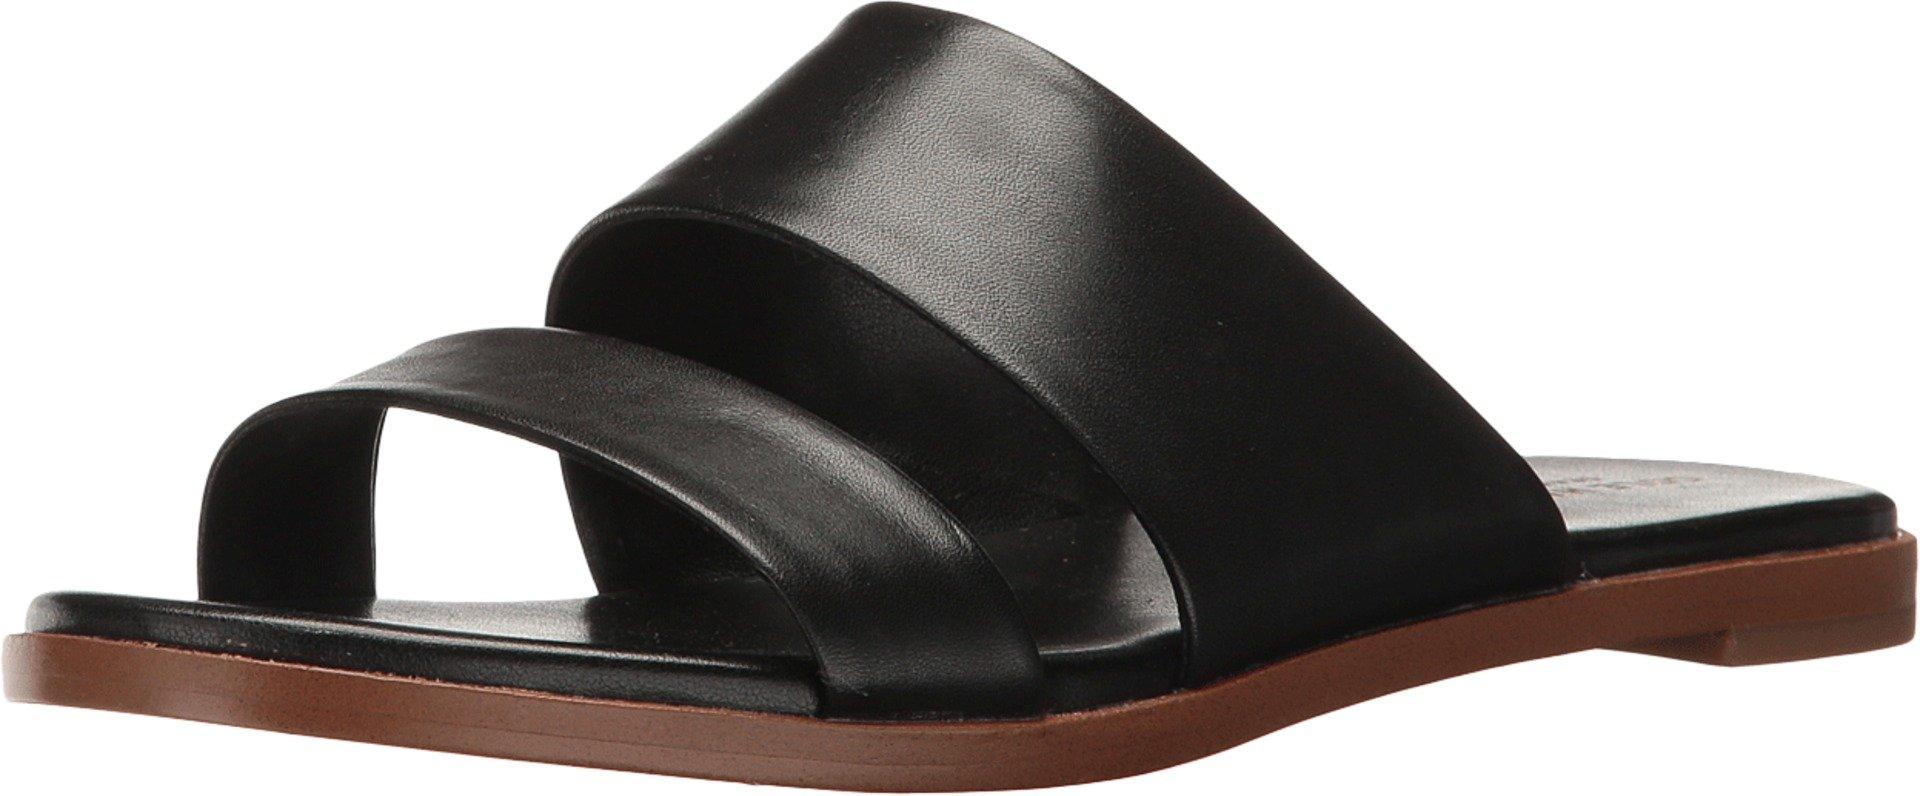 Cole Haan Women's Anica Slide Sandal, Black, 8.5 B US